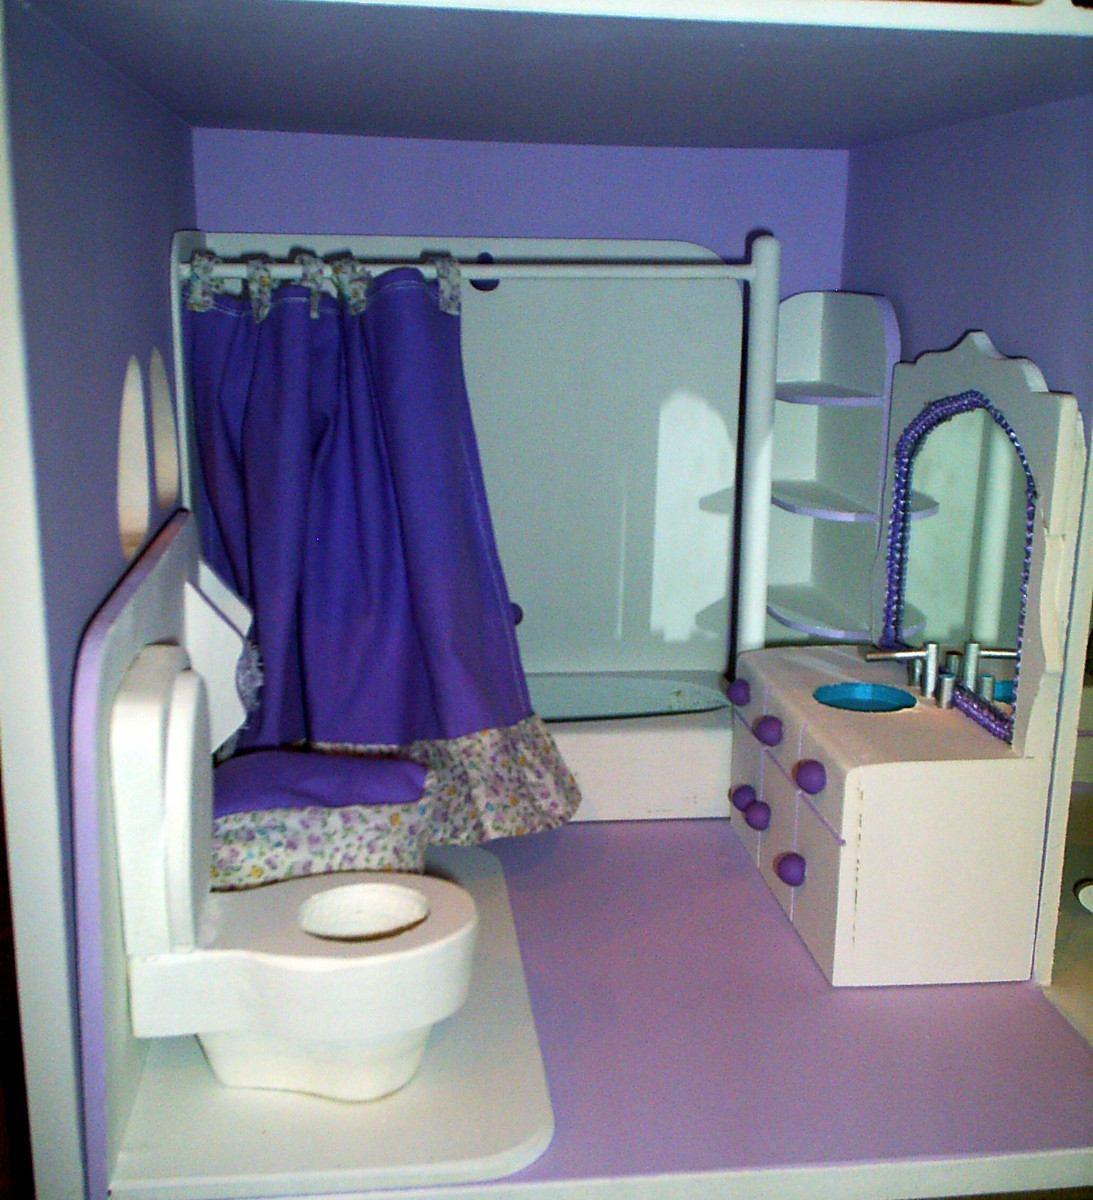 Como hacer muebles para barbies imagui - Como hacer muebles para casa de munecas ...